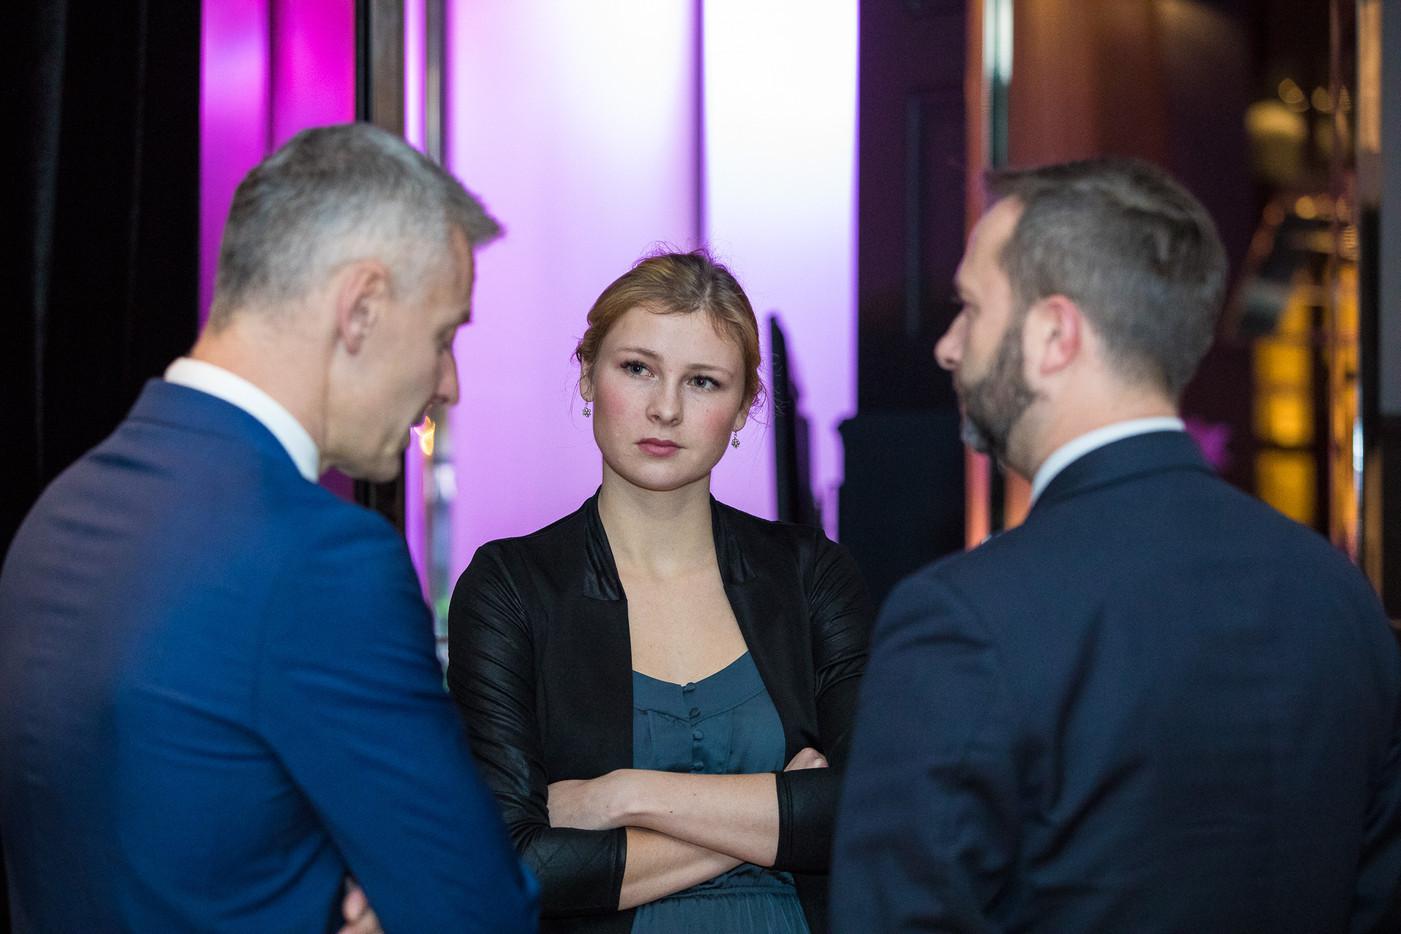 Milan Slapal, Odessa Primus, Michal Kora